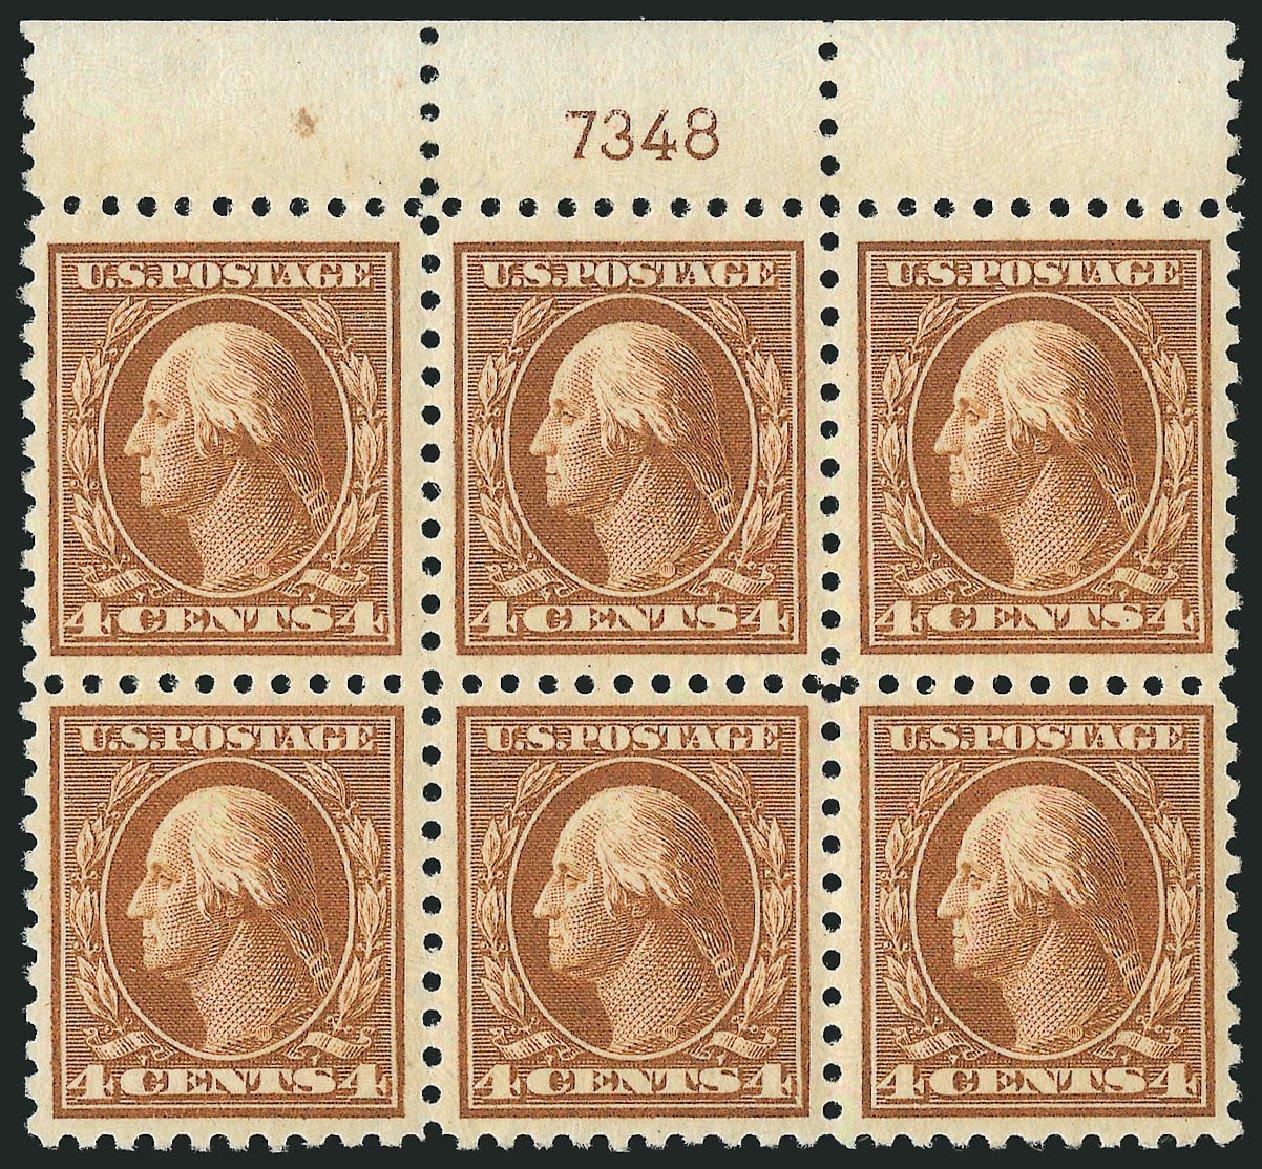 Cost of US Stamp Scott Catalogue #465 - 4c 1916 Washington Perf 10. Robert Siegel Auction Galleries, Feb 2015, Sale 1093, Lot 384